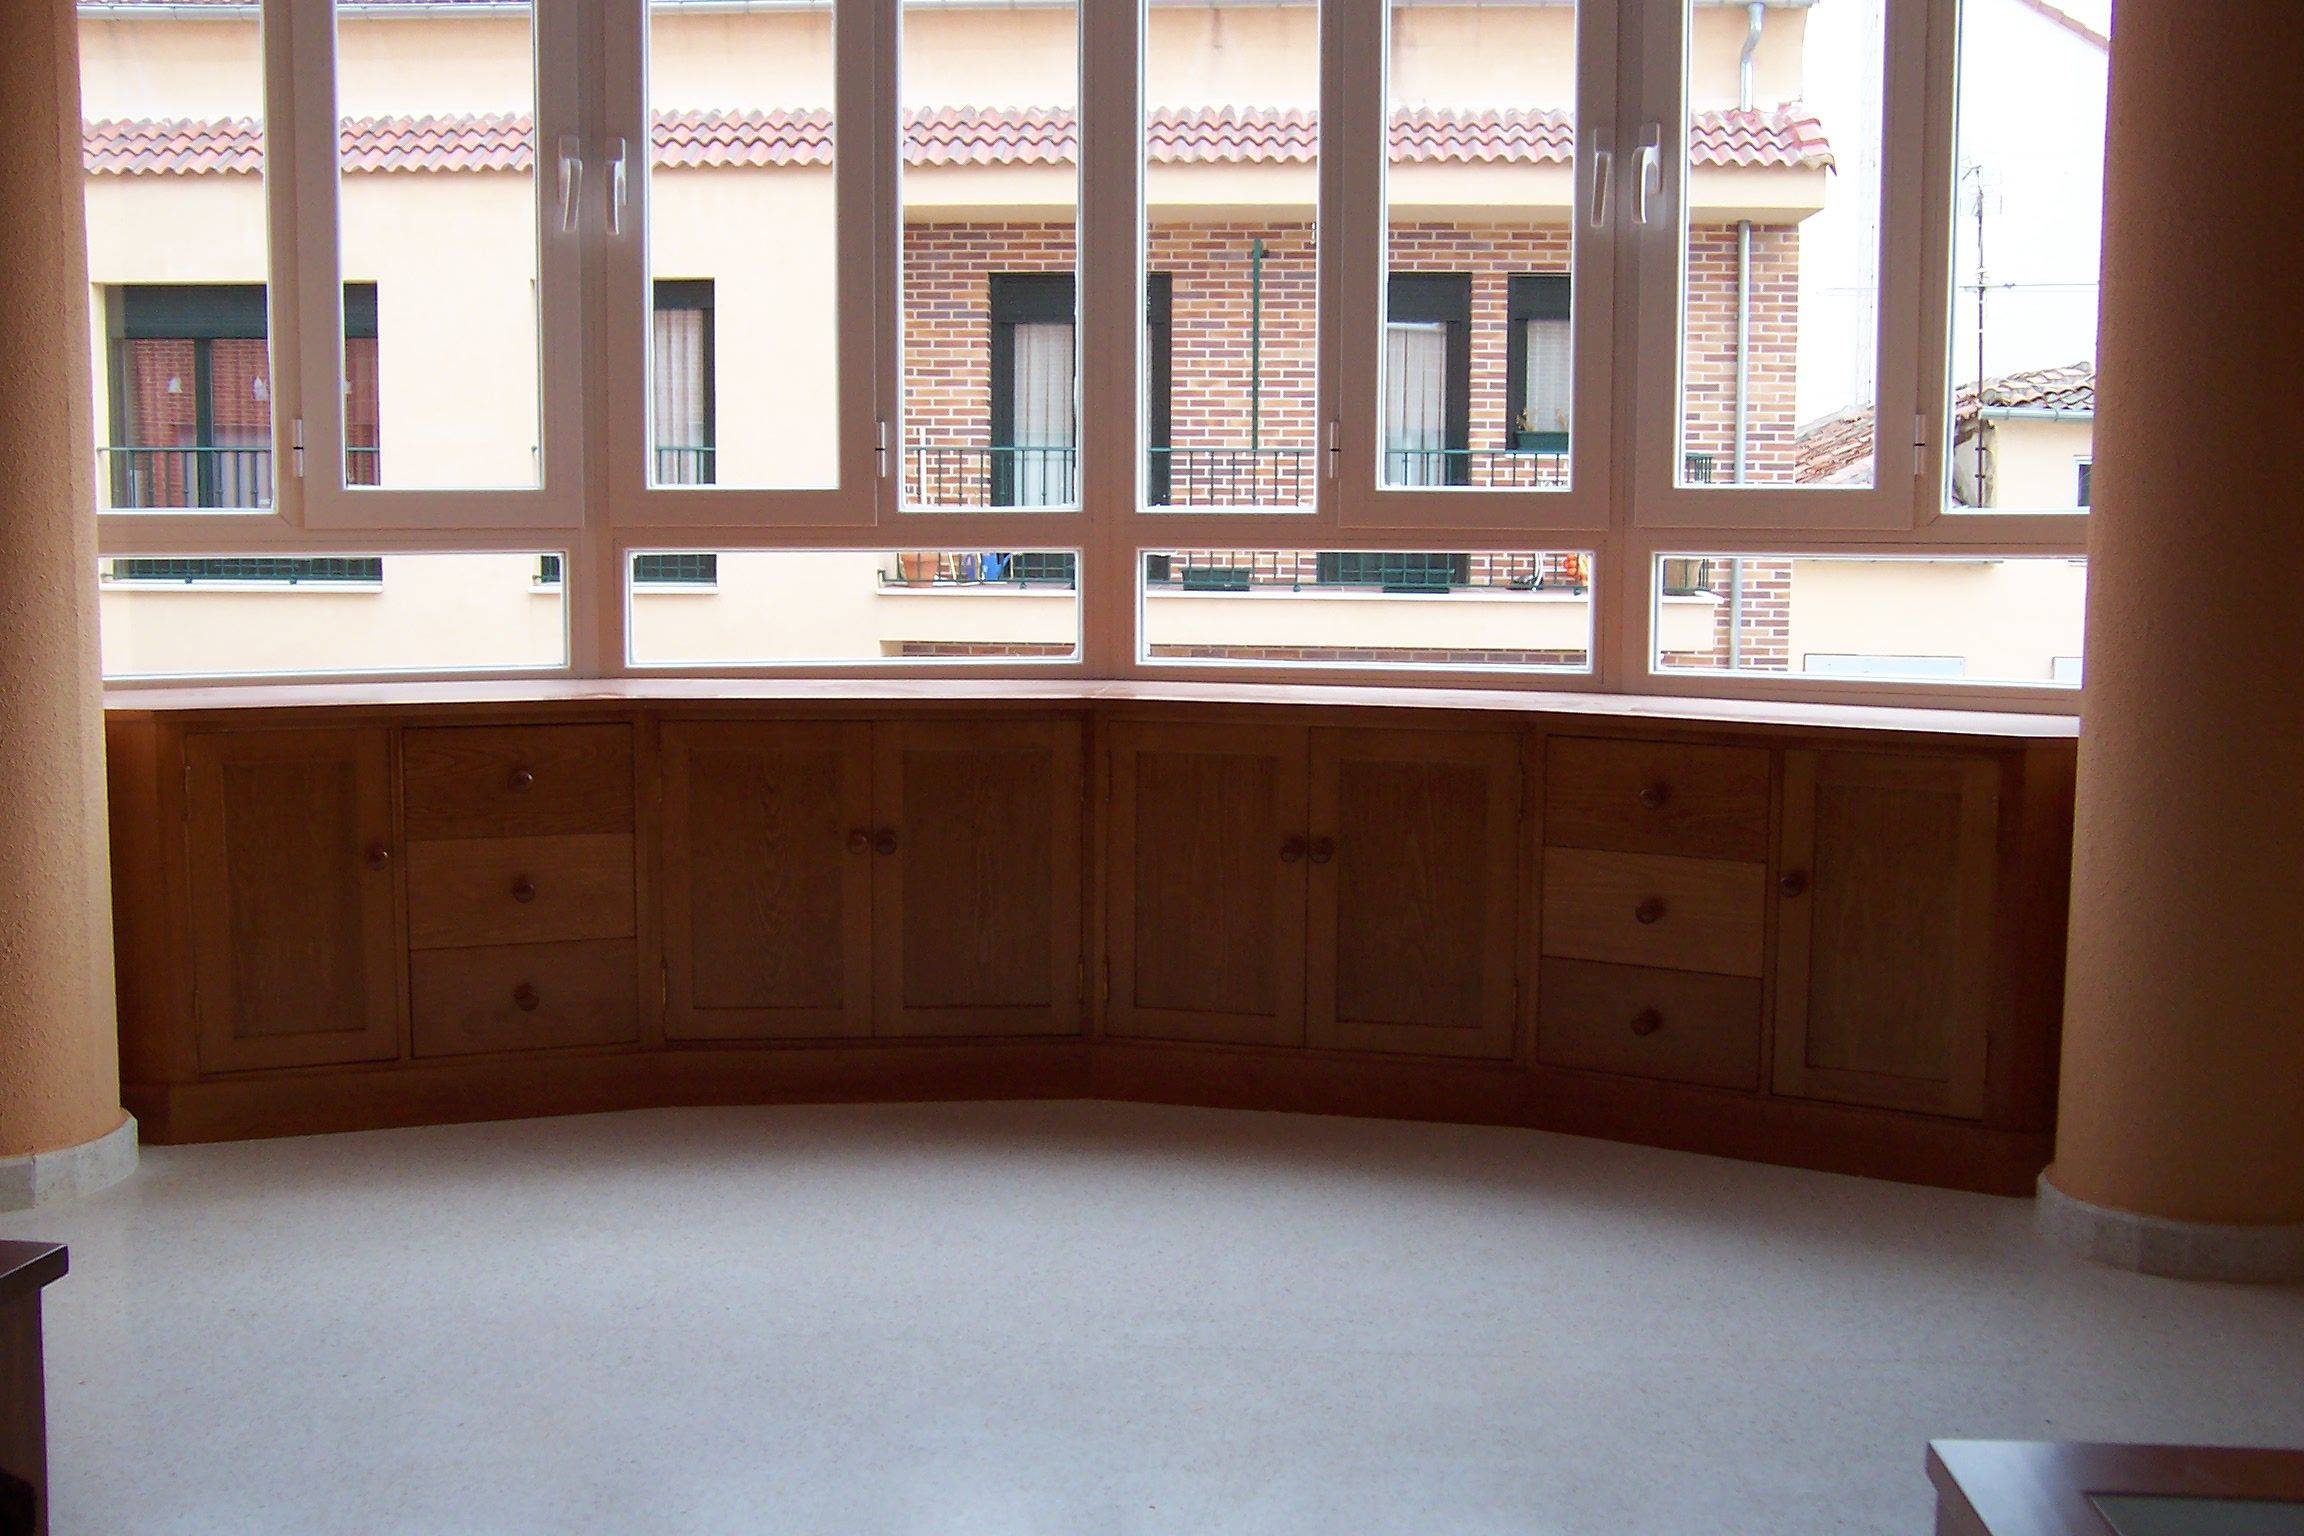 Mueble bajo semicircular bajo ventanal. #mueblesamedida #mueblesdemadera #madera #mueblesdesalon